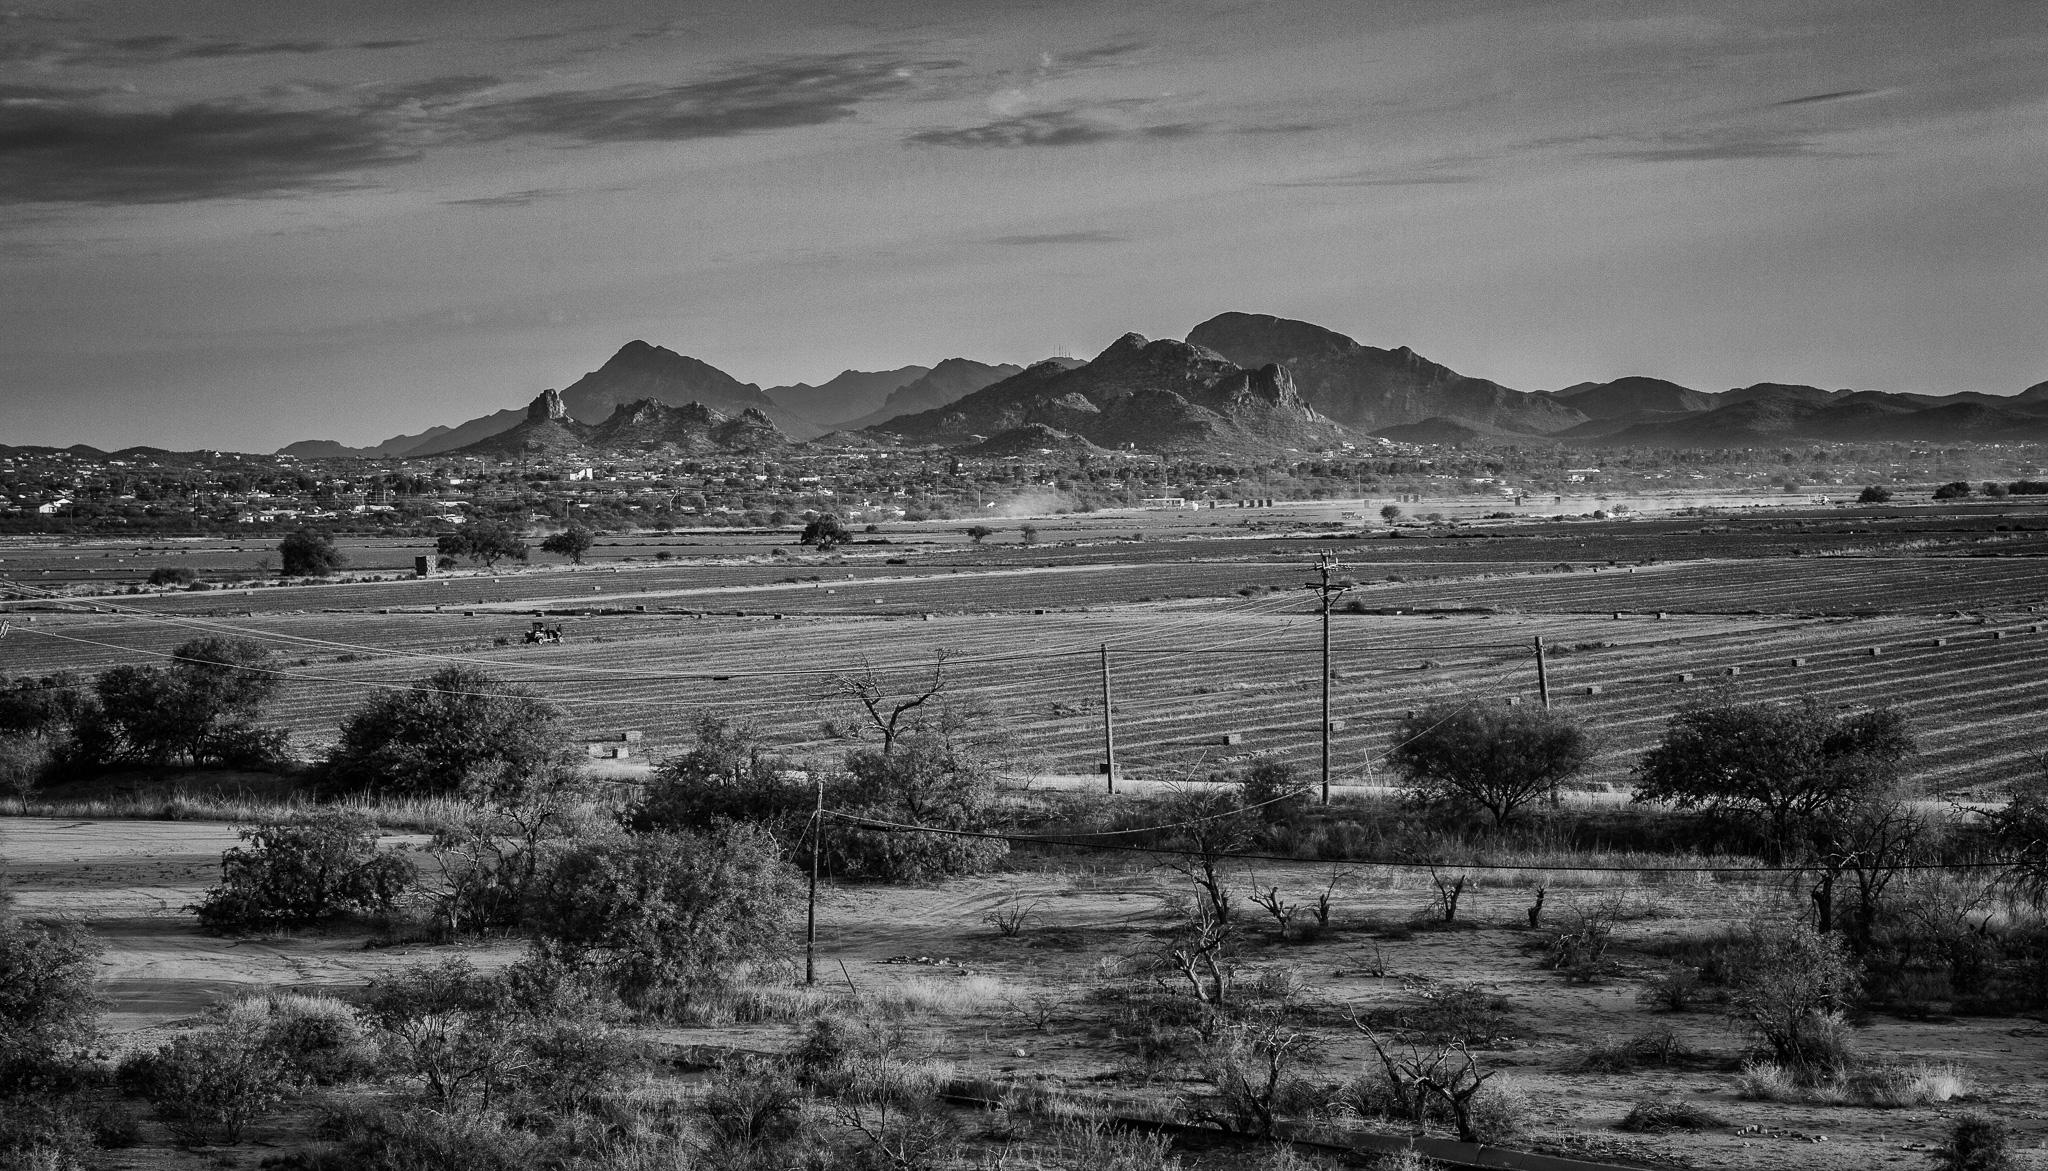 Mission San Xavier del Bac Farms - Tucson